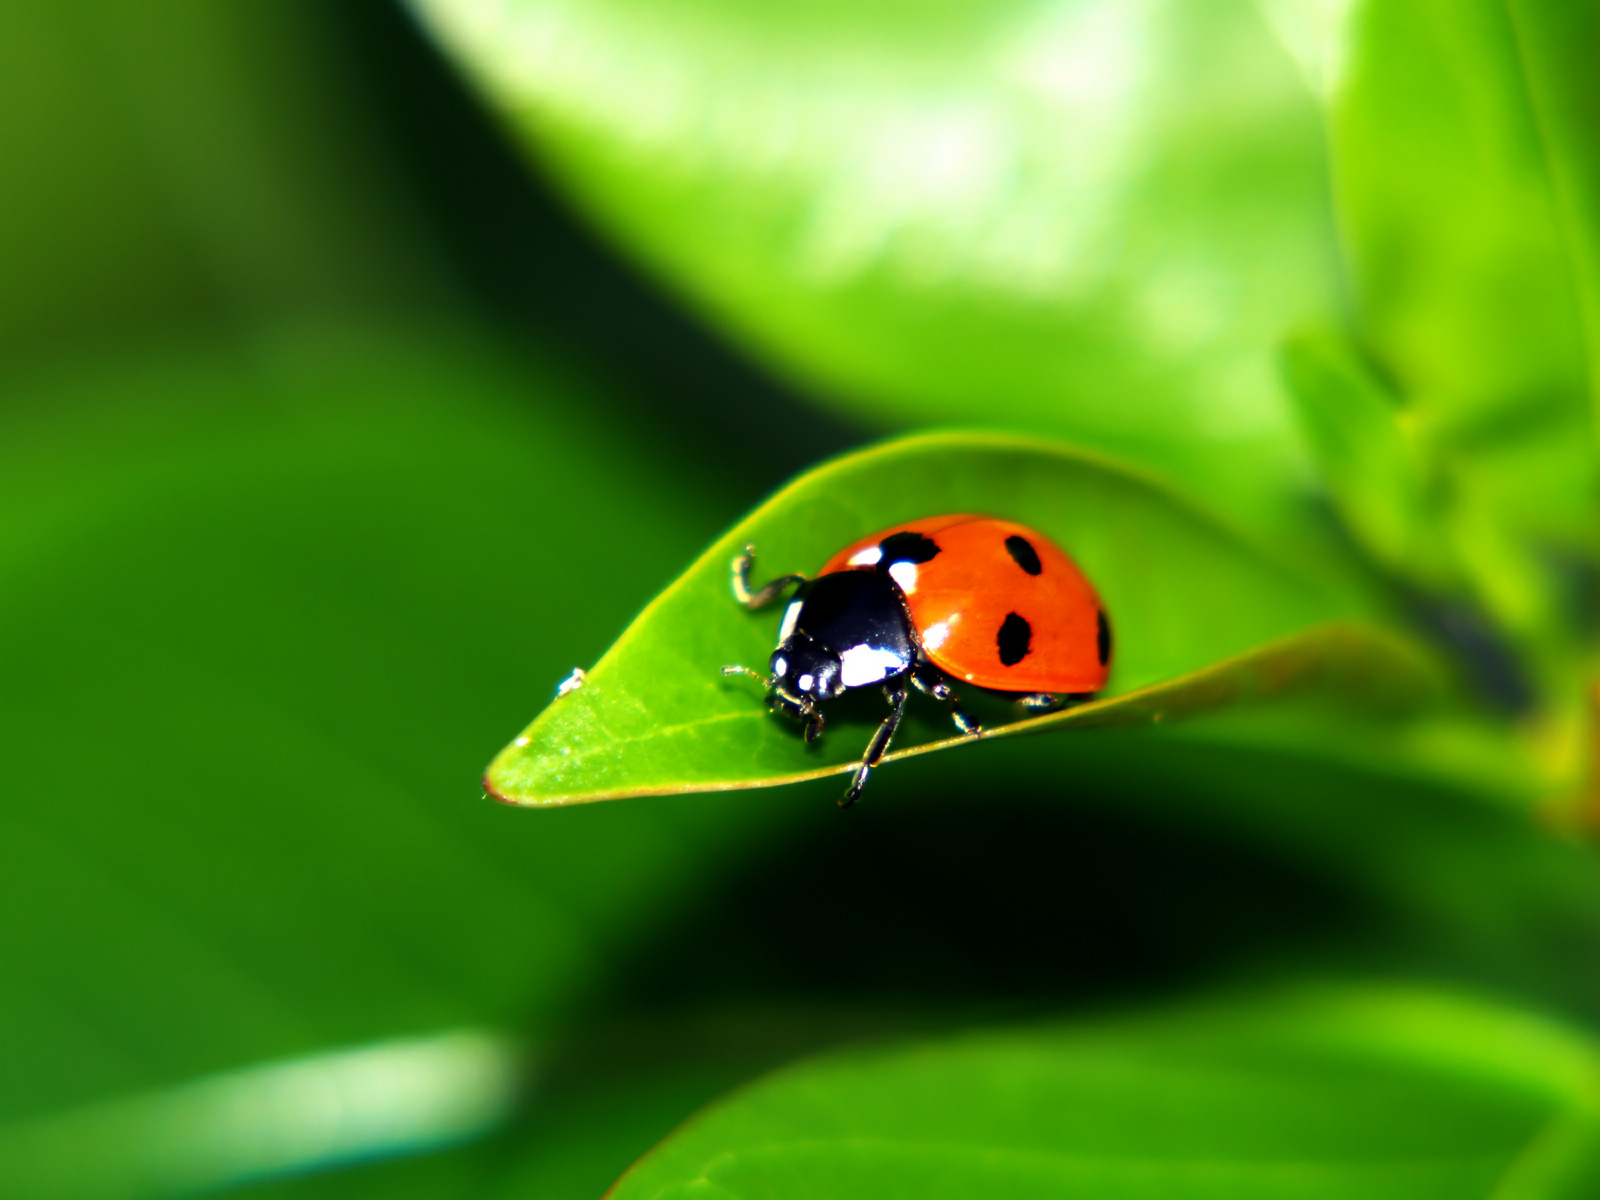 free ladybug wallpaper 43698